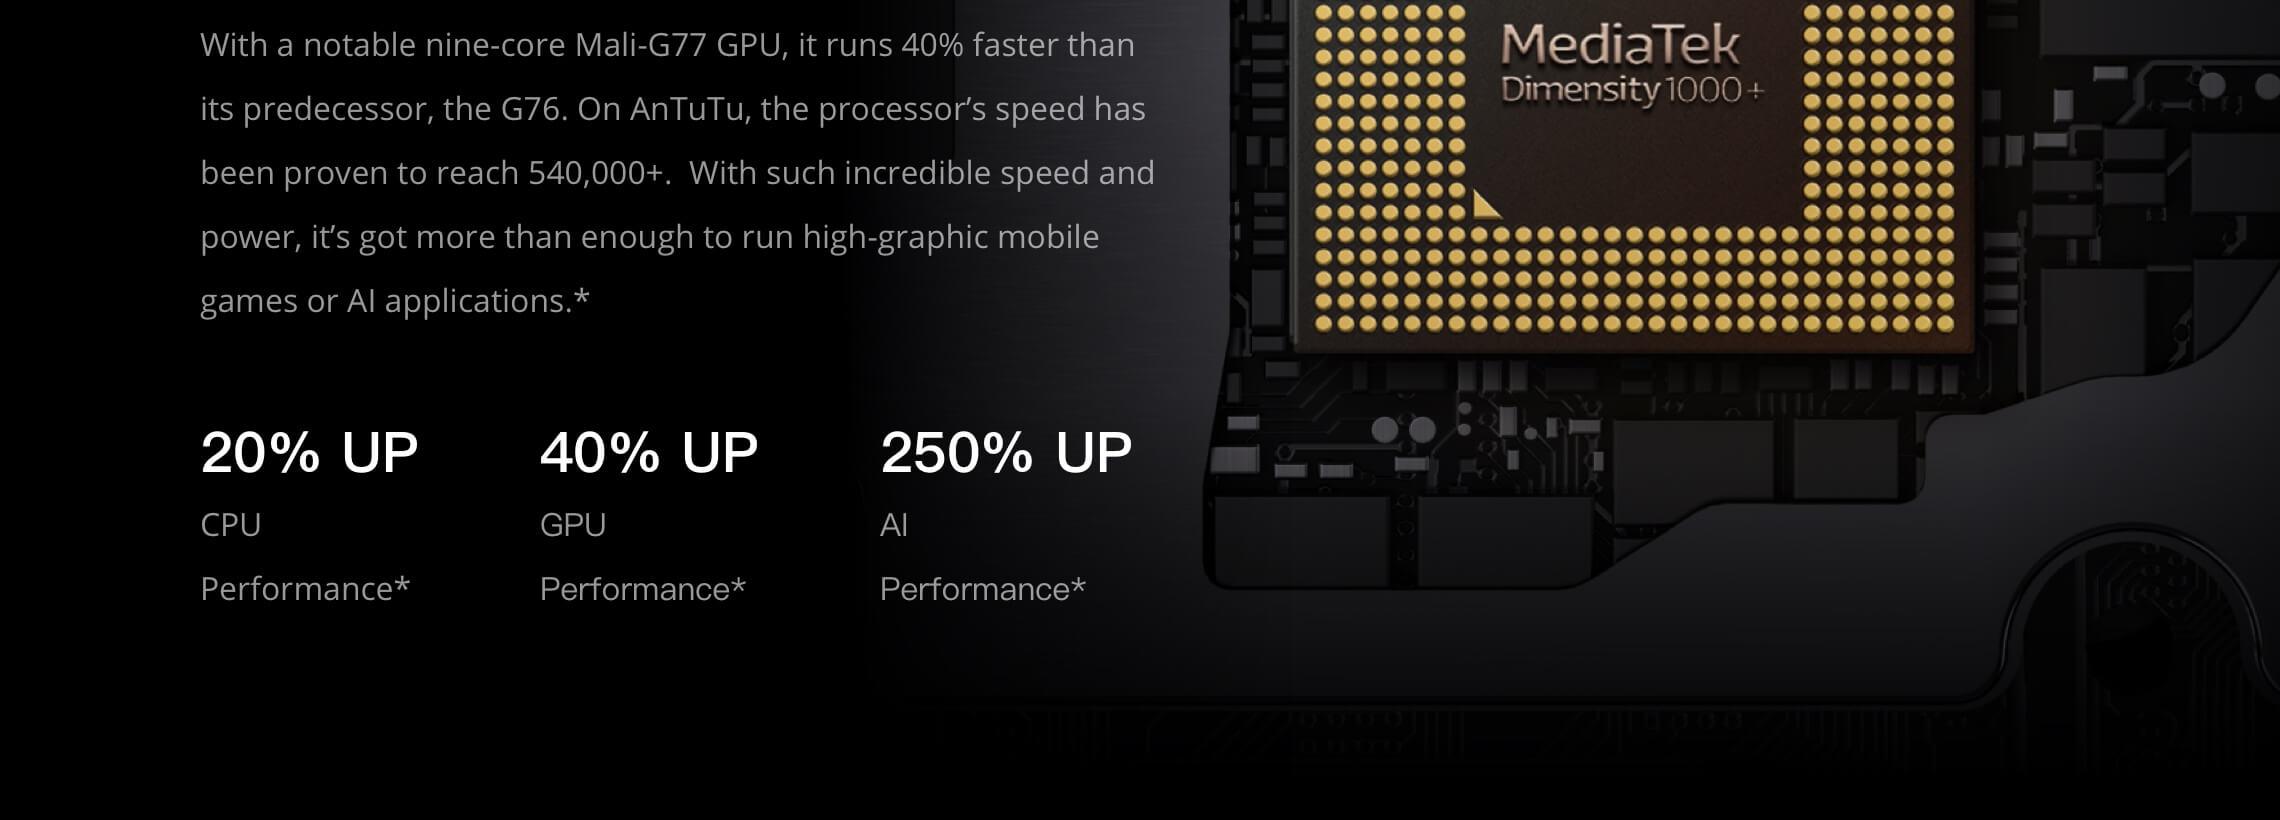 Realme x7 pro 5g technology